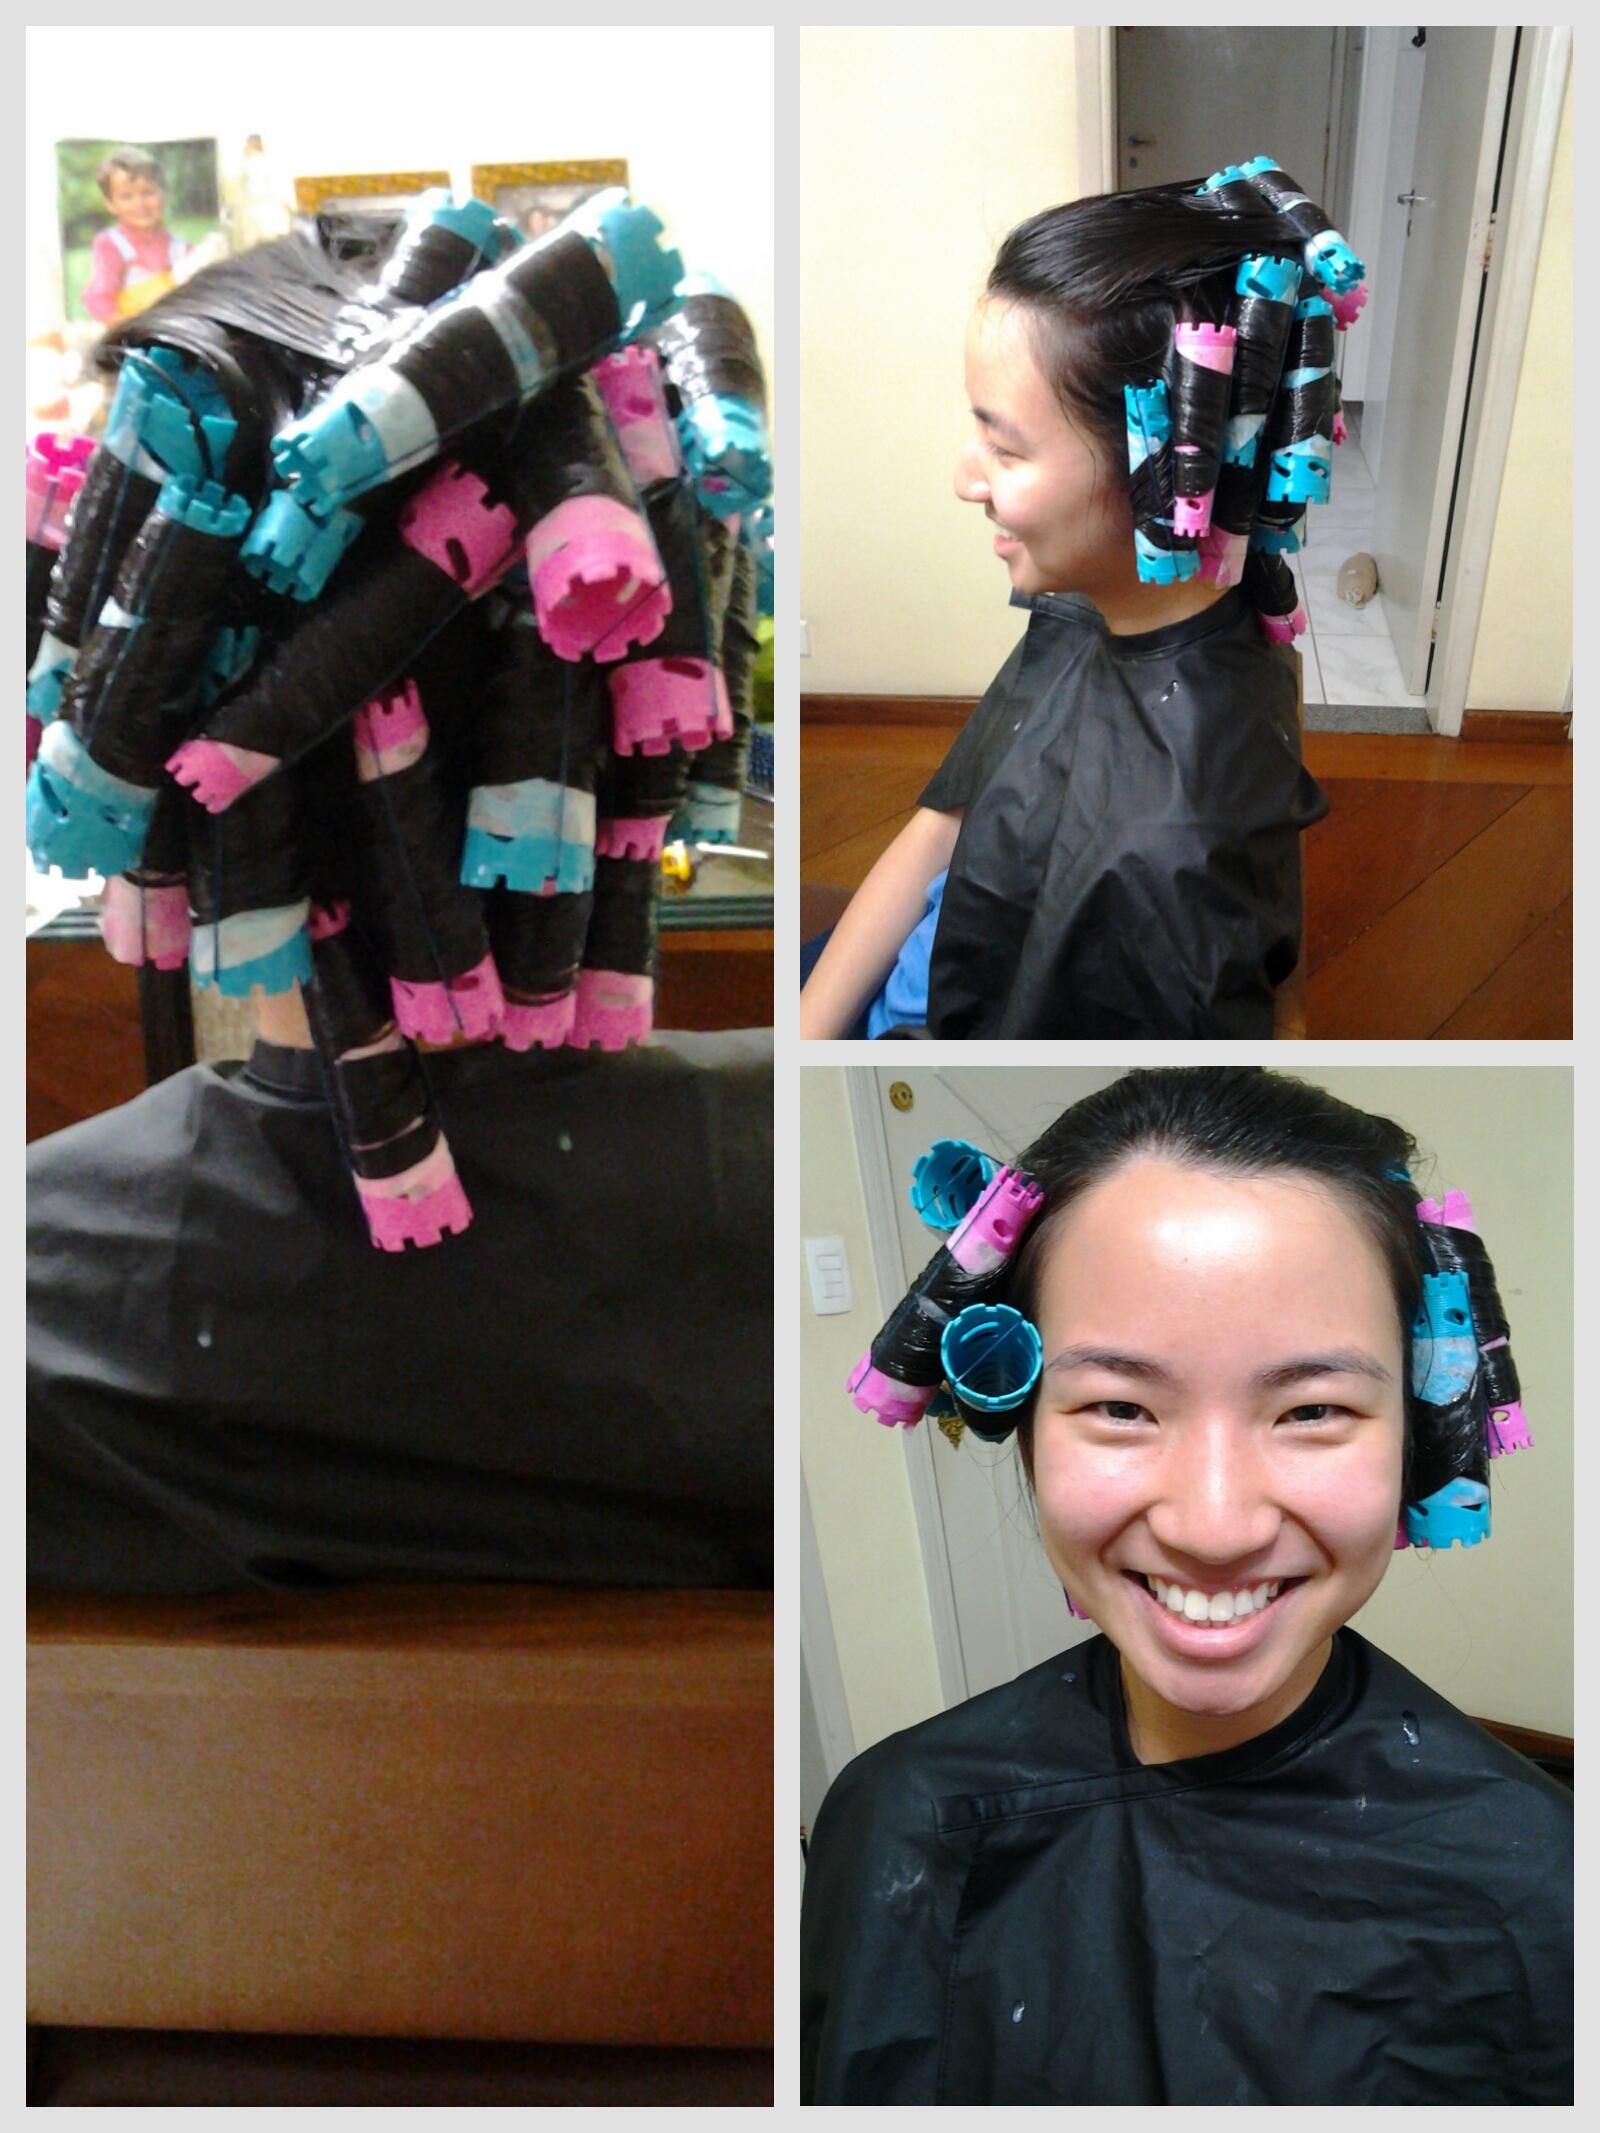 Permanente natural para mocinhas~ #belezanatural #belezaasiatica #belezaoriental #cabelo #hair #cut #waves #permanente #koreanstyle #kbeauty #kcosmetic #kcosmetics #makeoriental #coreana #beleza #kpop #novidade #tendencia #rotinacoreana #cuidadooriental #culturekorean #culturacoreana #empoderamento #feminina #rotinacoreana #thebest  #newlook #make #oriental #lifestyle #makestyle  cabelo cabeleireiro(a) maquiador(a)